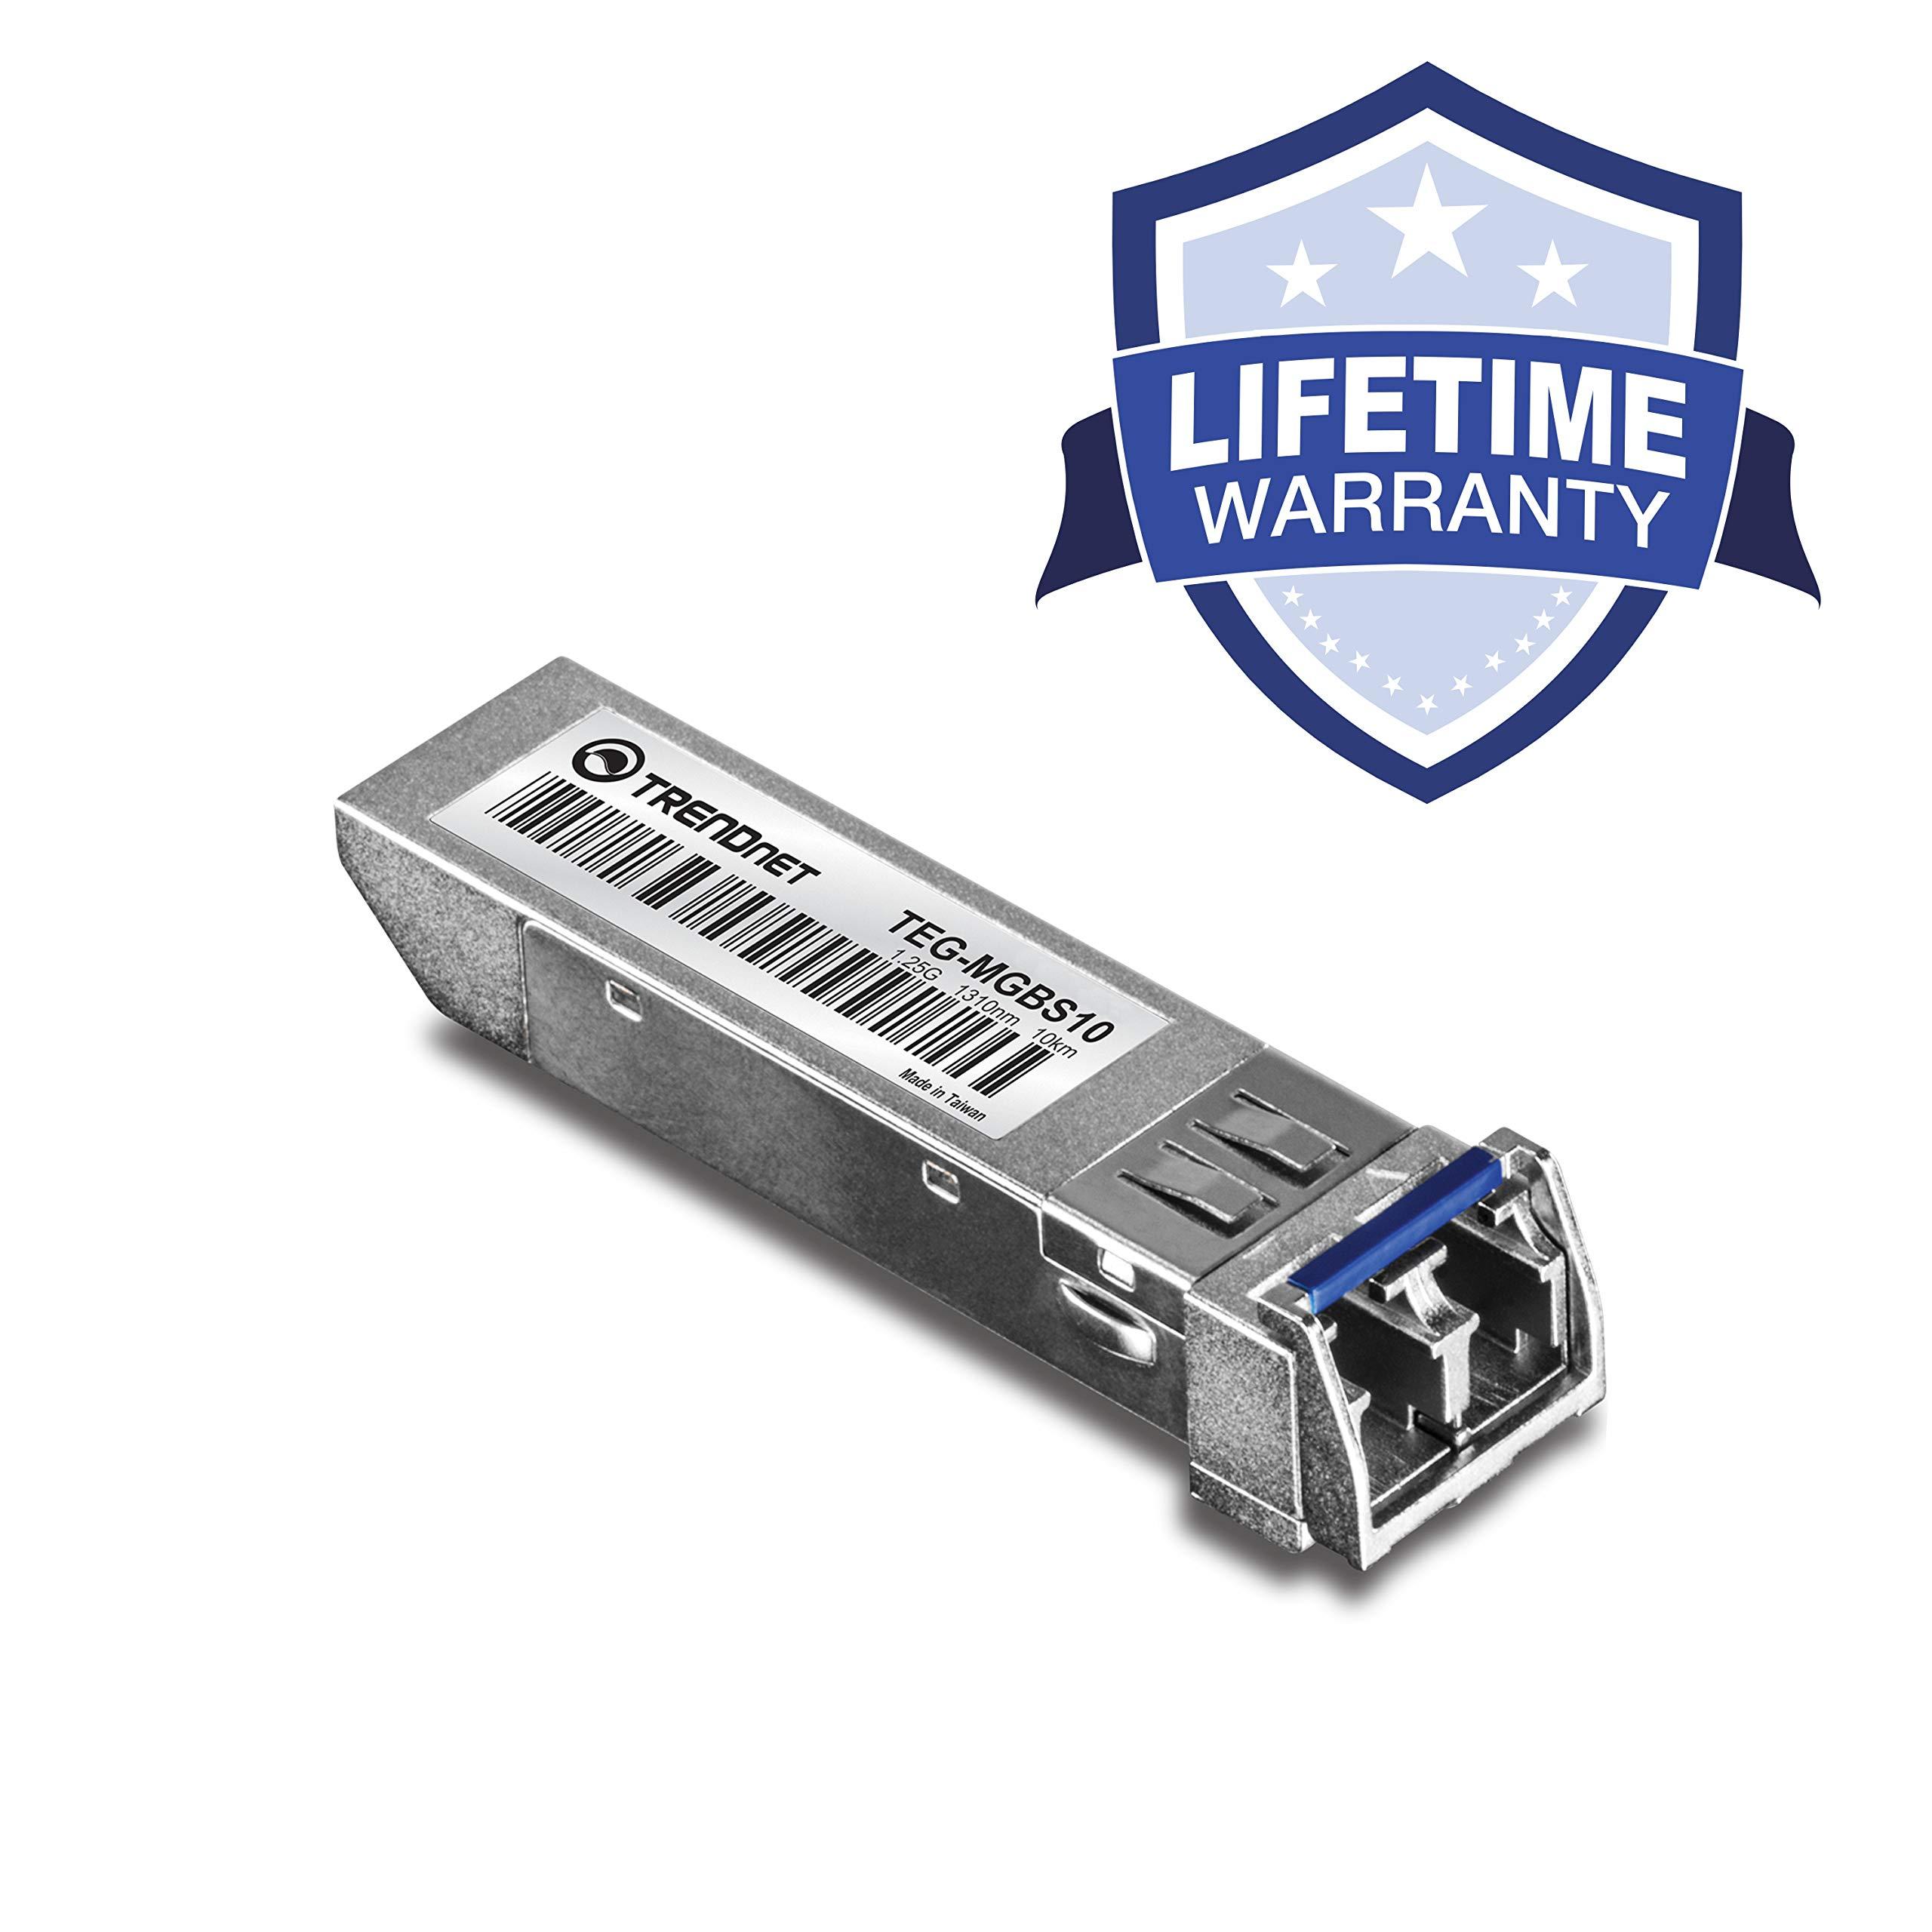 TRENDnet Gigabit SFP Module, Single-Mode, Mini-GBIC, Up to 10 km, Lifetime Protection, TEG-MGBS10